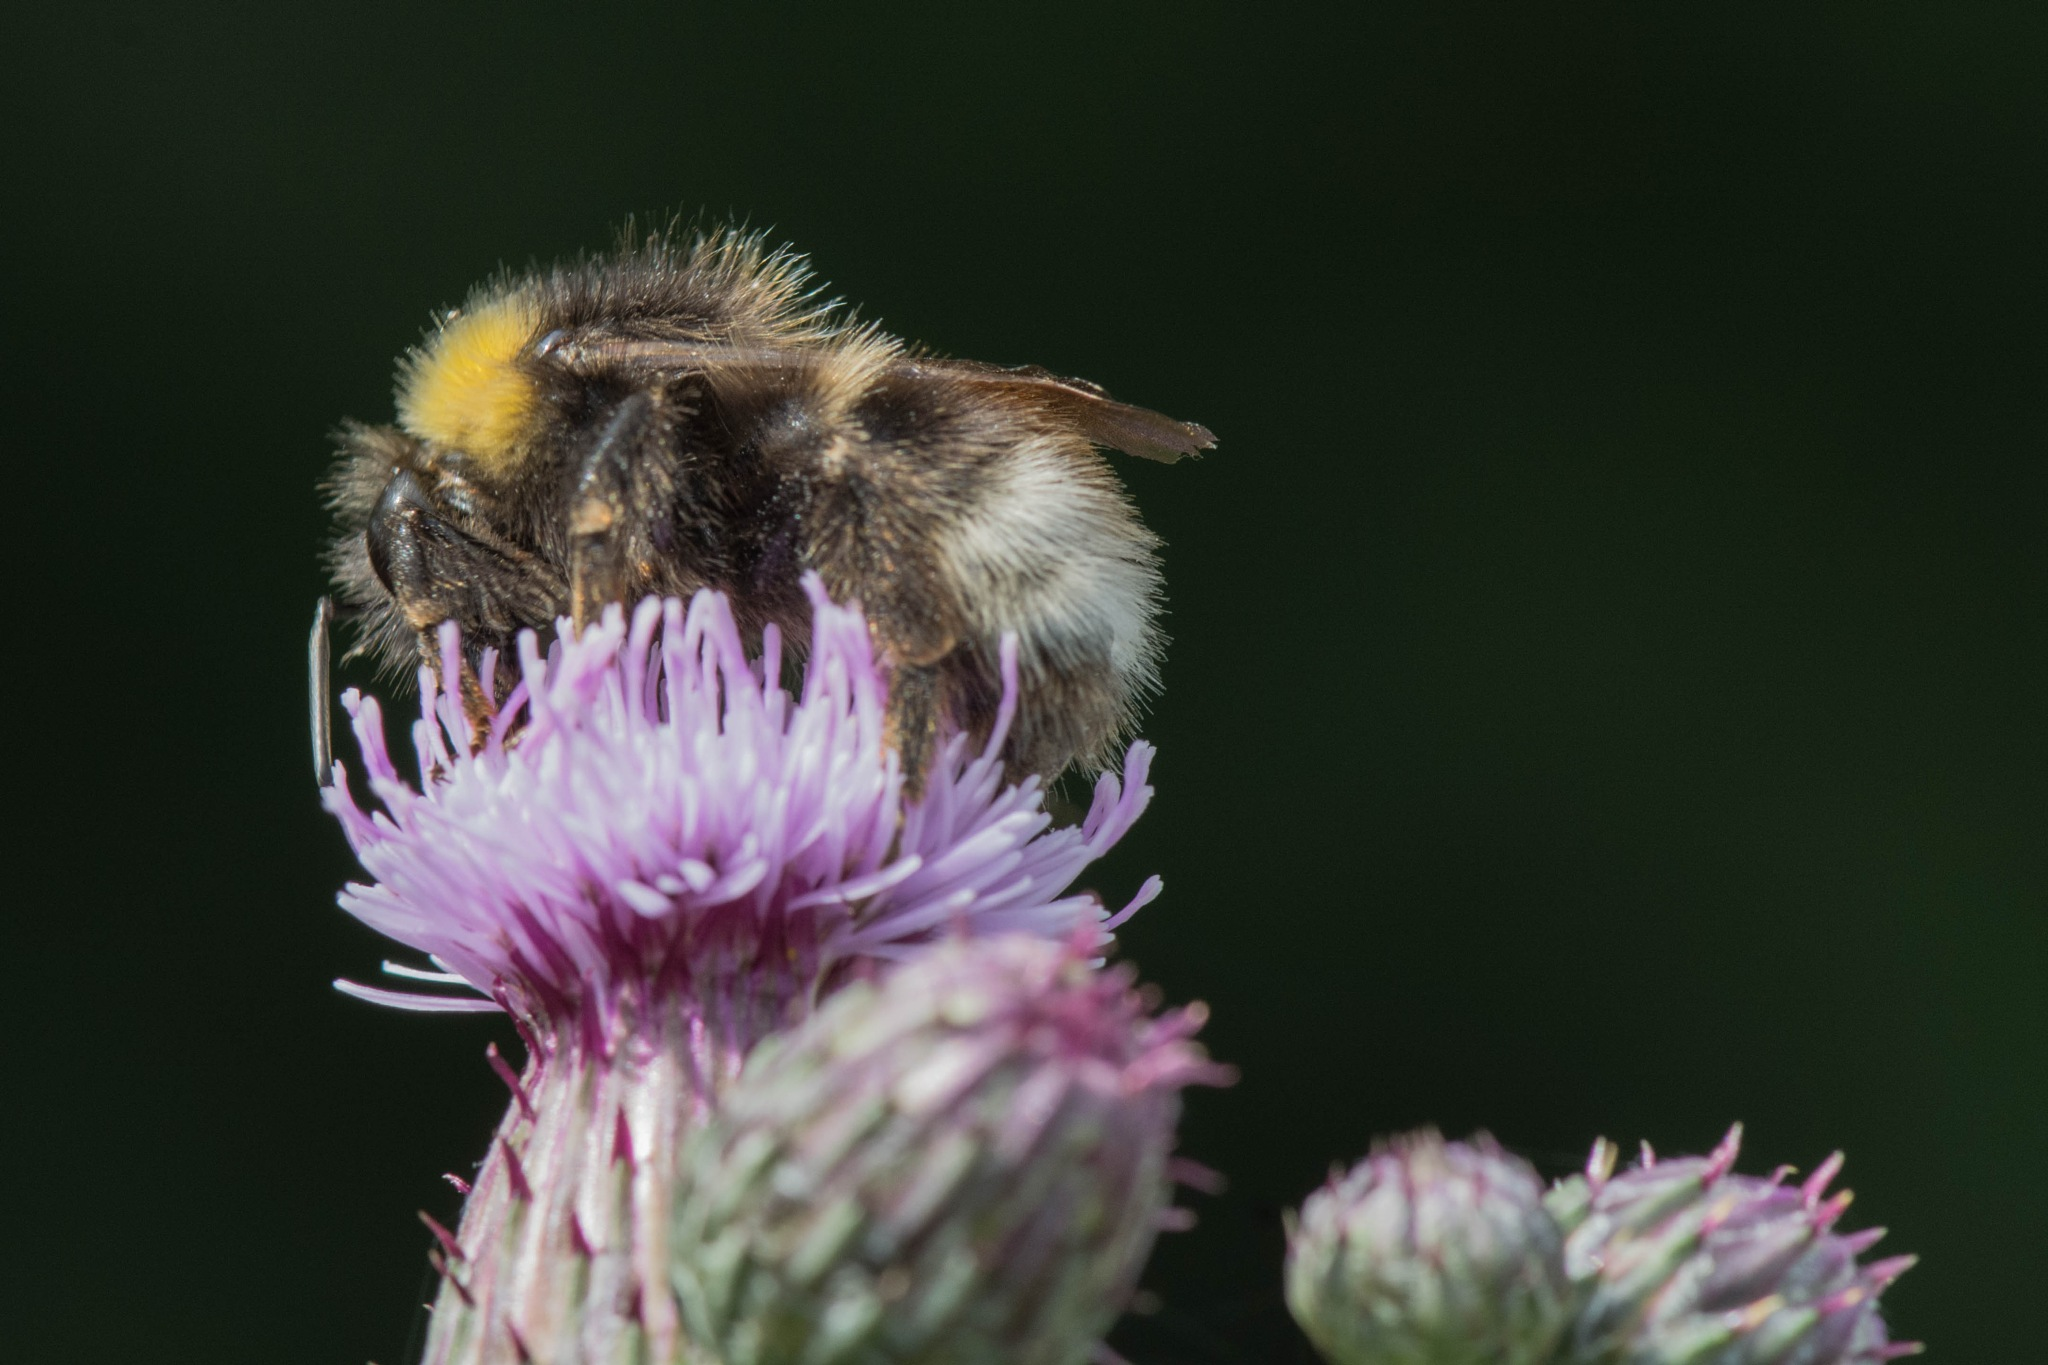 Bumblebee by Ruud van Leeuwen